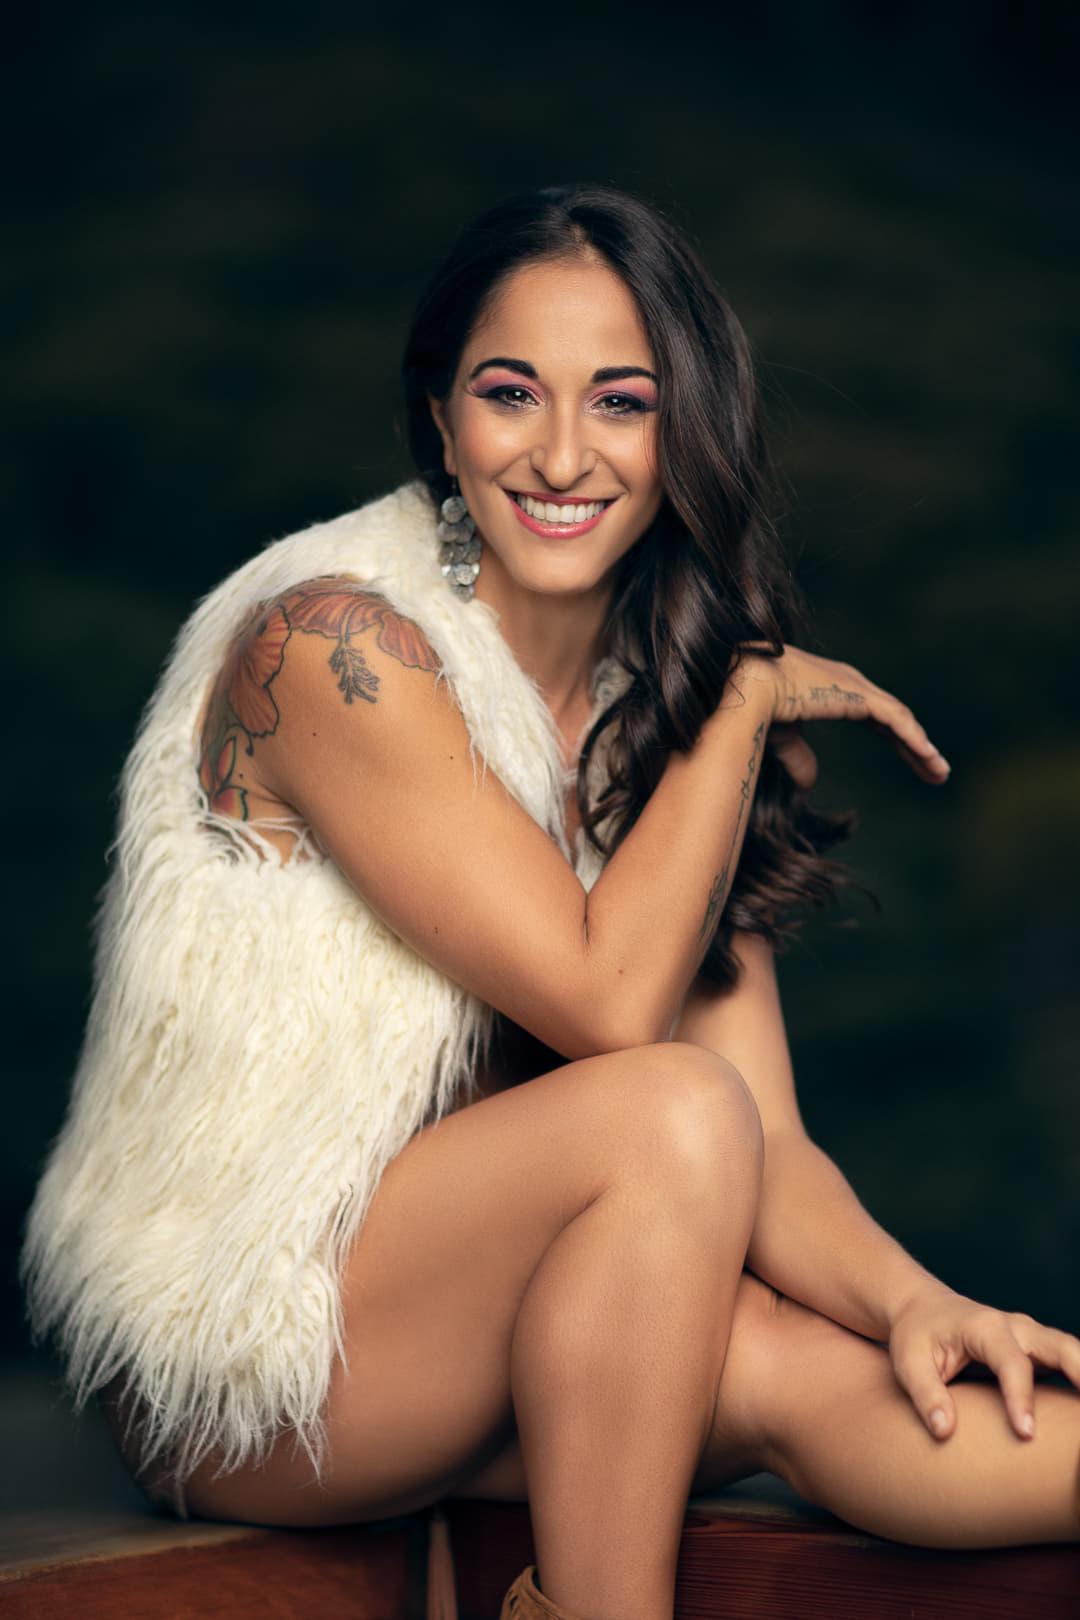 Ashley Sissenwein: Master Program student  - Study Beauty, Fashion, Bridal, New Media and Theater Makeup  - Study Character & SFX Makeup  - Study Hair Designing